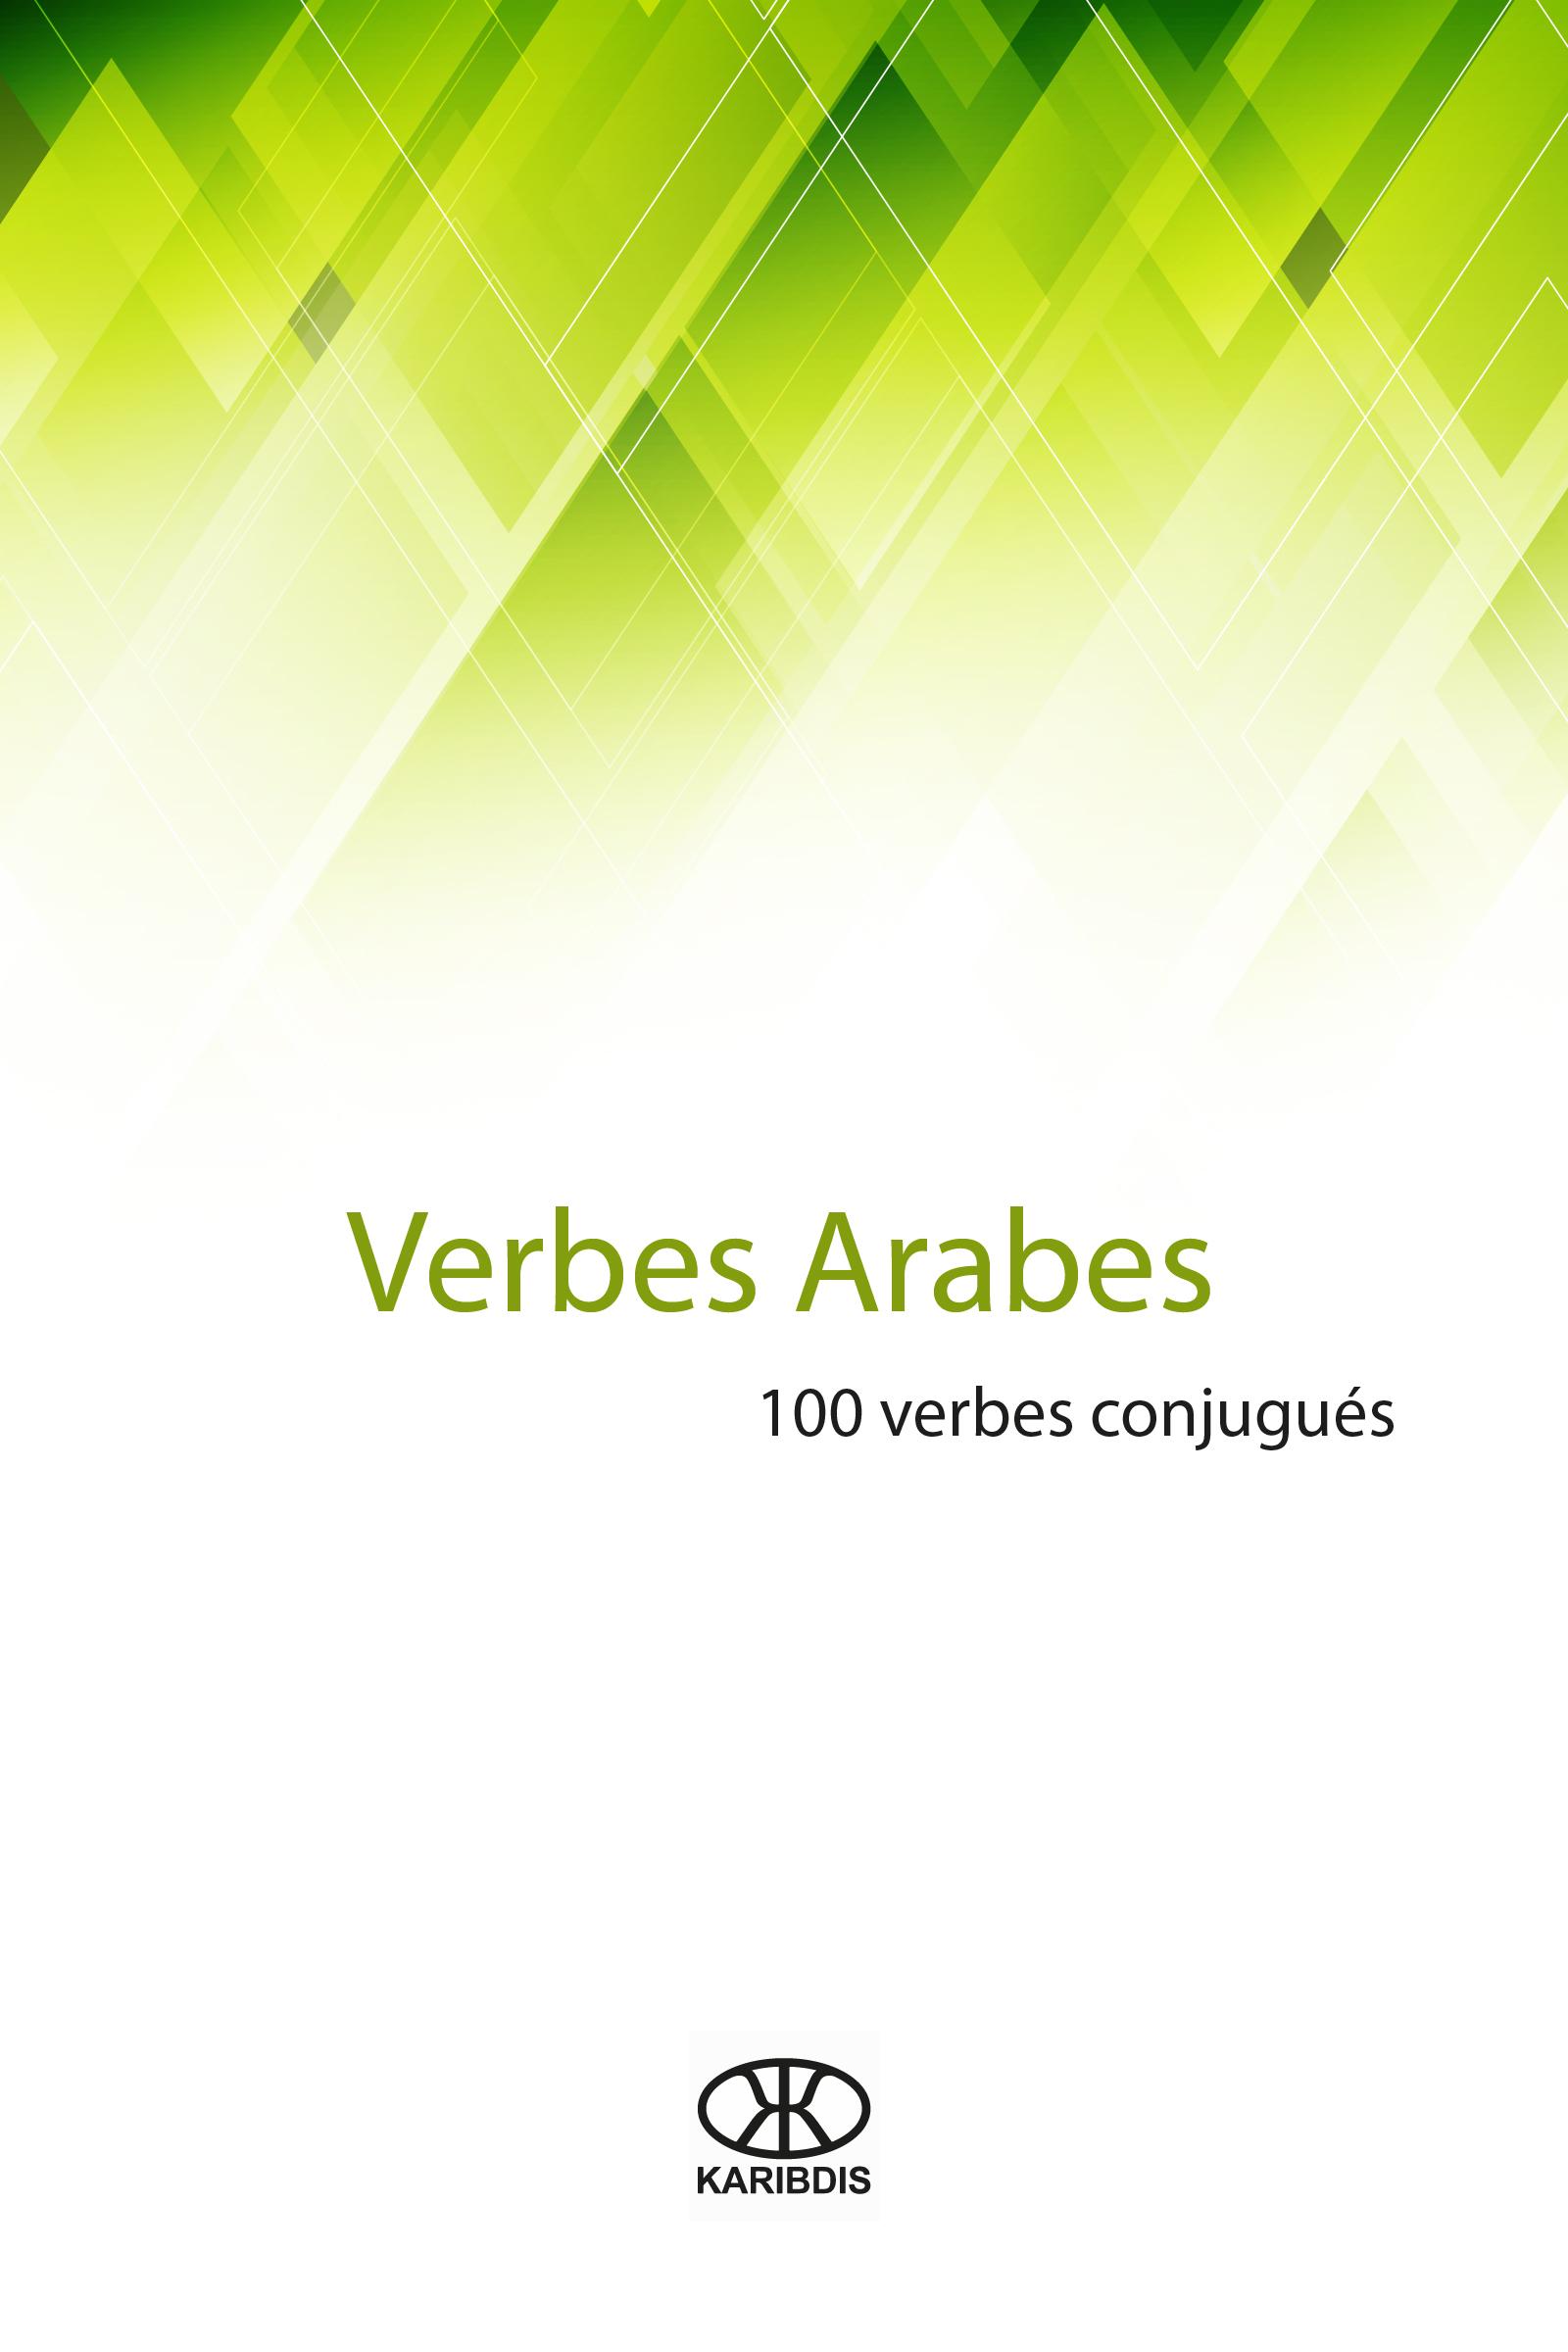 Smashwords Verbes Arabes 100 Verbes Conjugues A Book By Karibdis